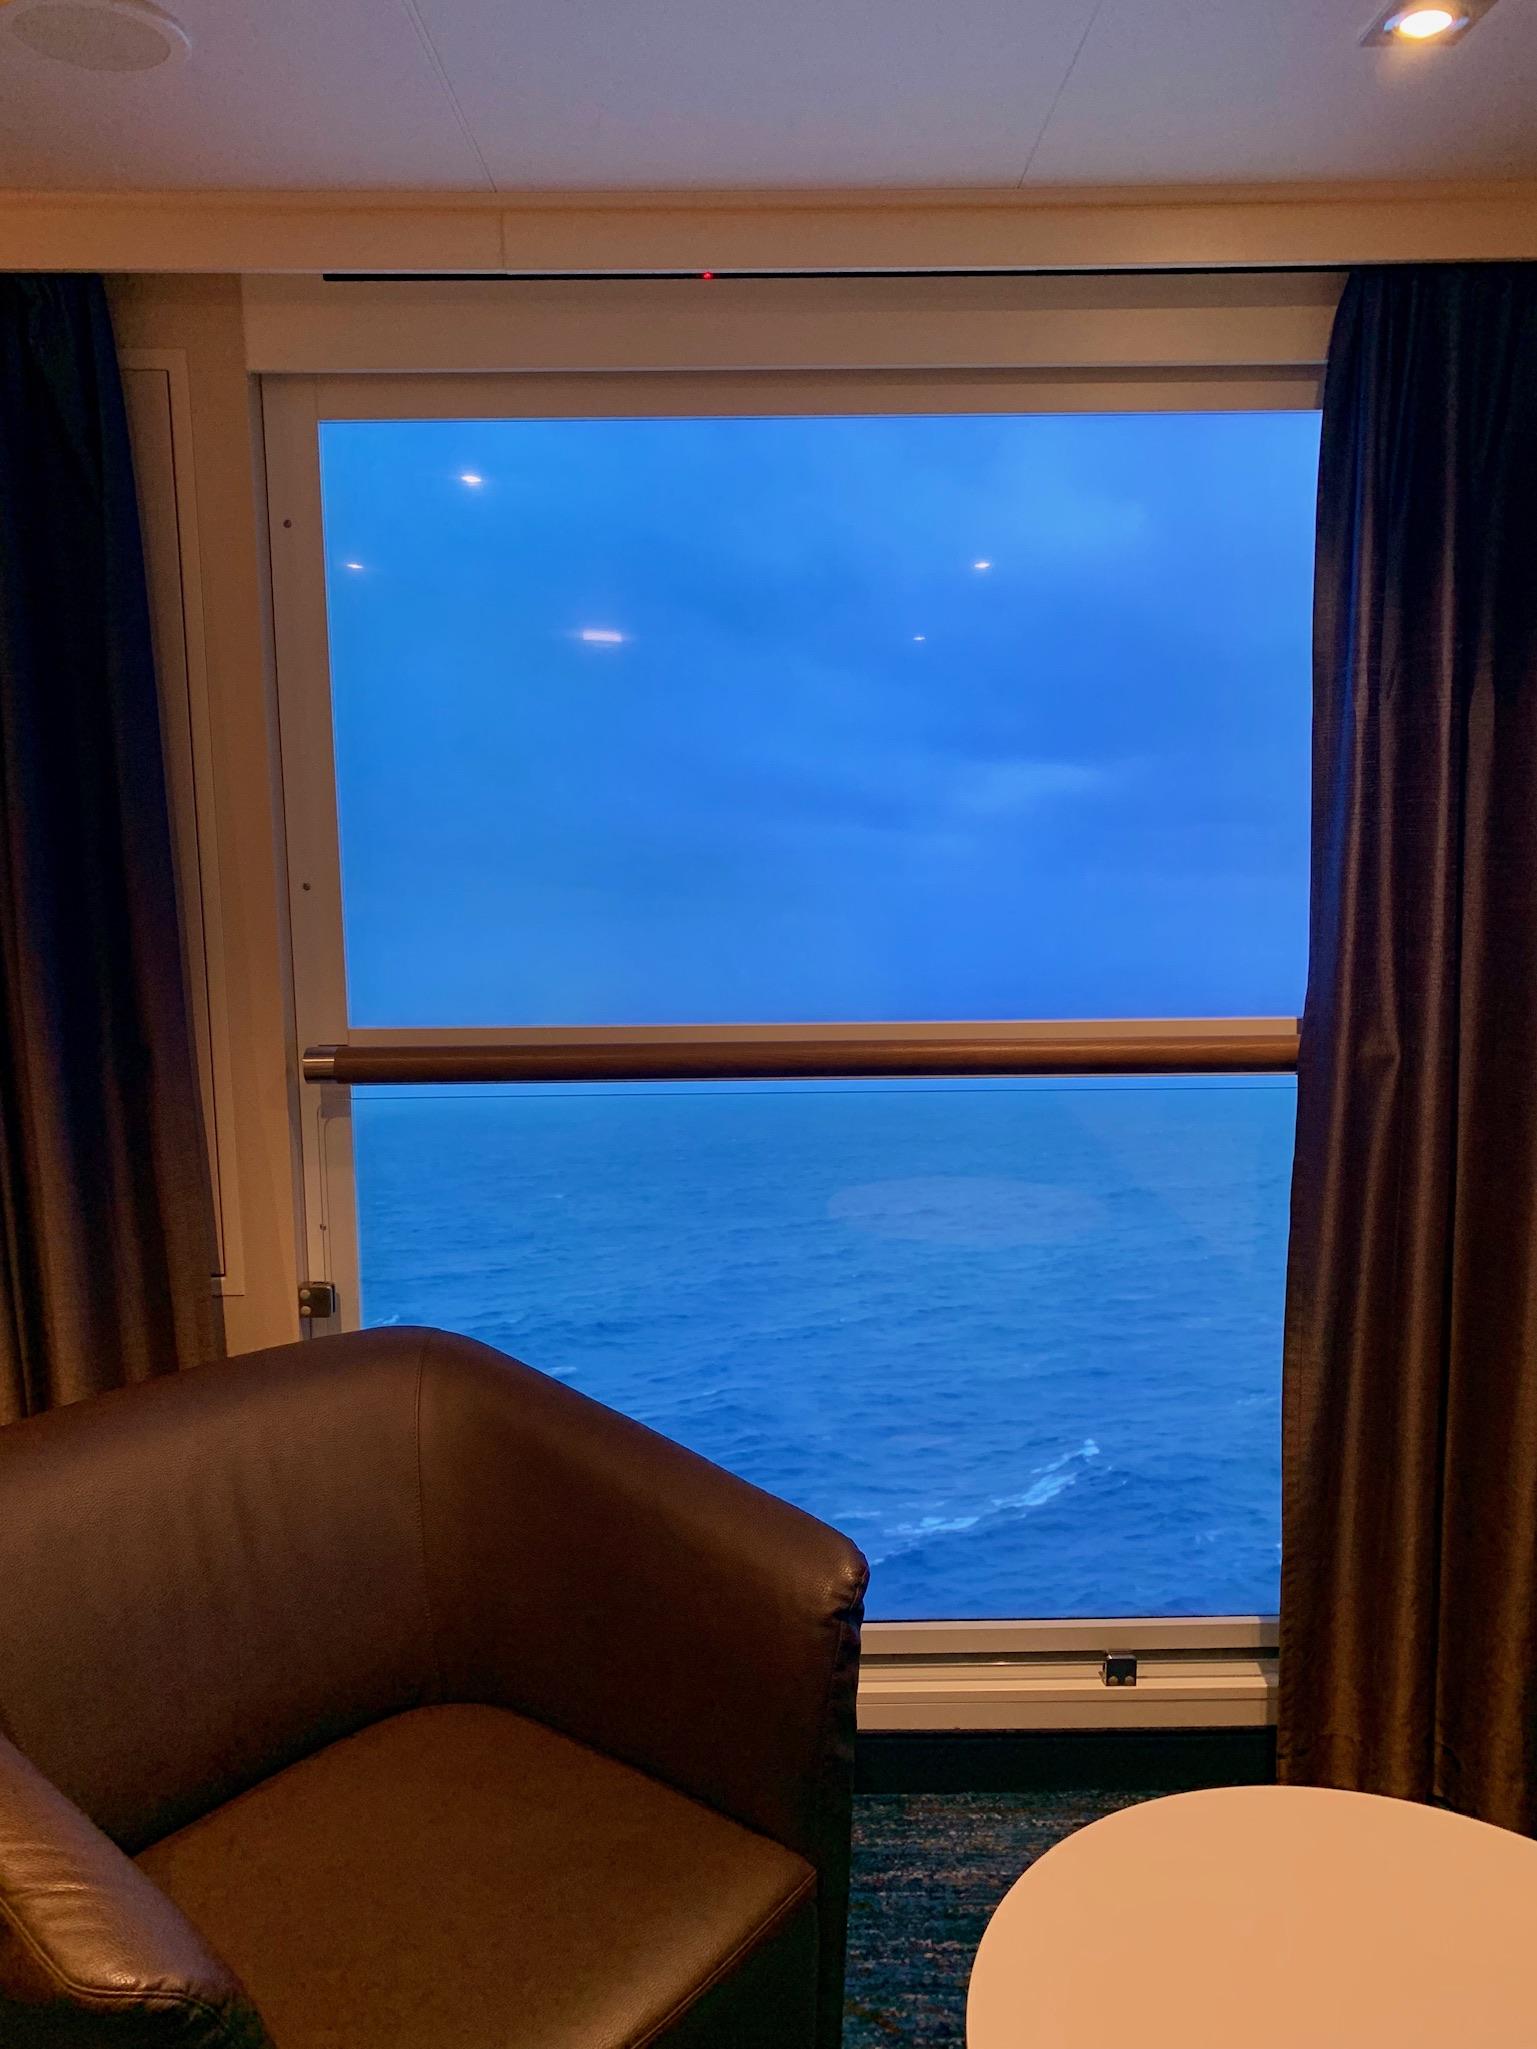 NCL Joy Room Concierge Family Inside Virtual Balcony.jpg